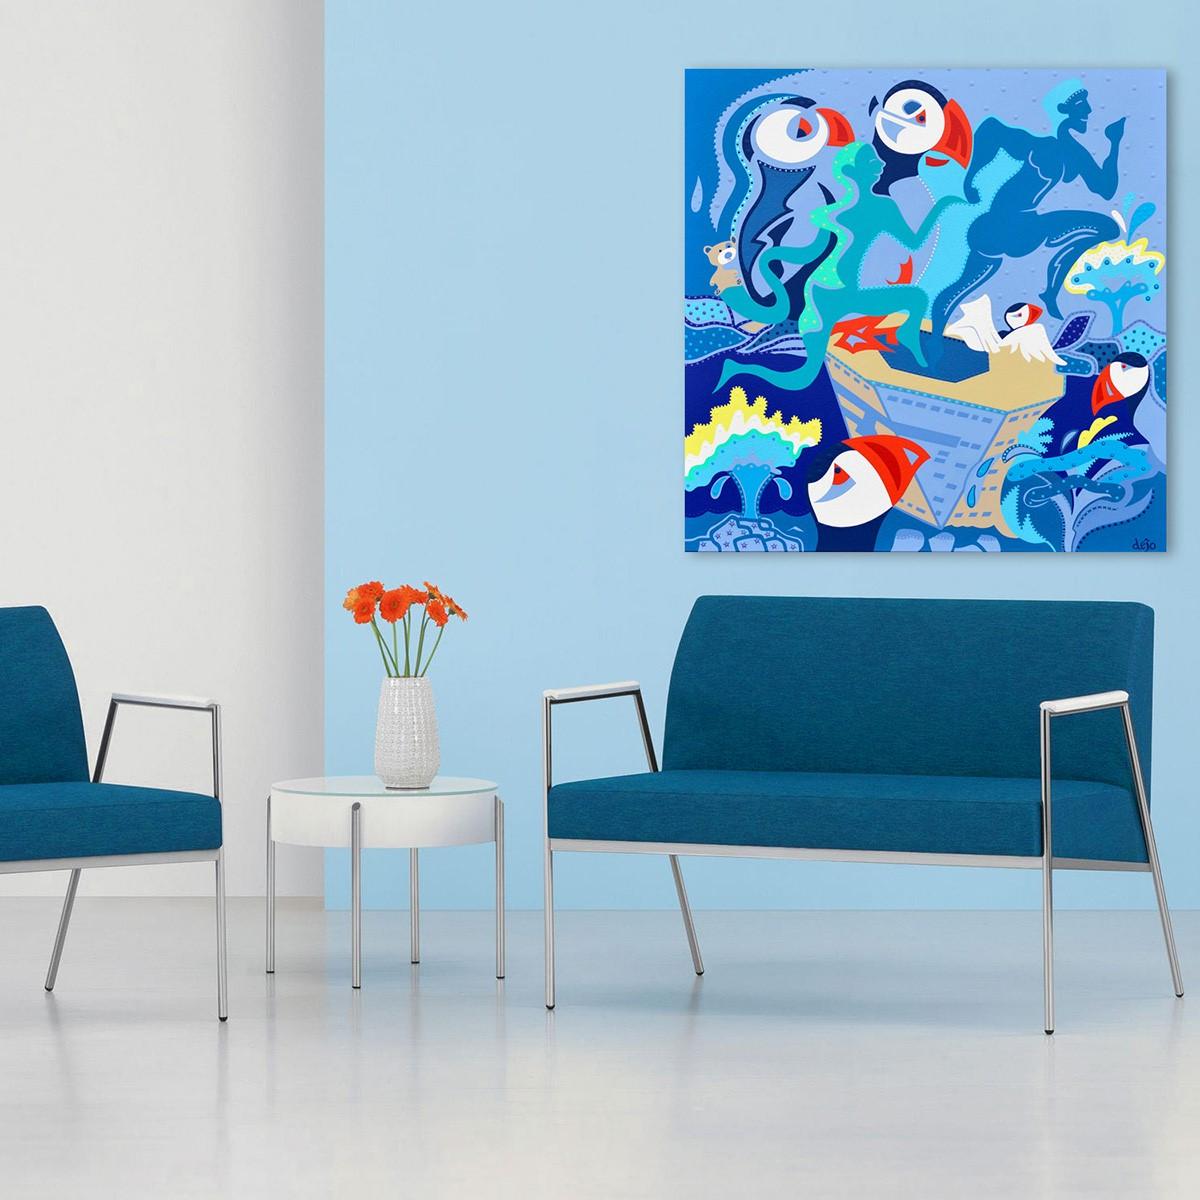 Toyism_Dejo-Tour-of-Dreams_Livingroom